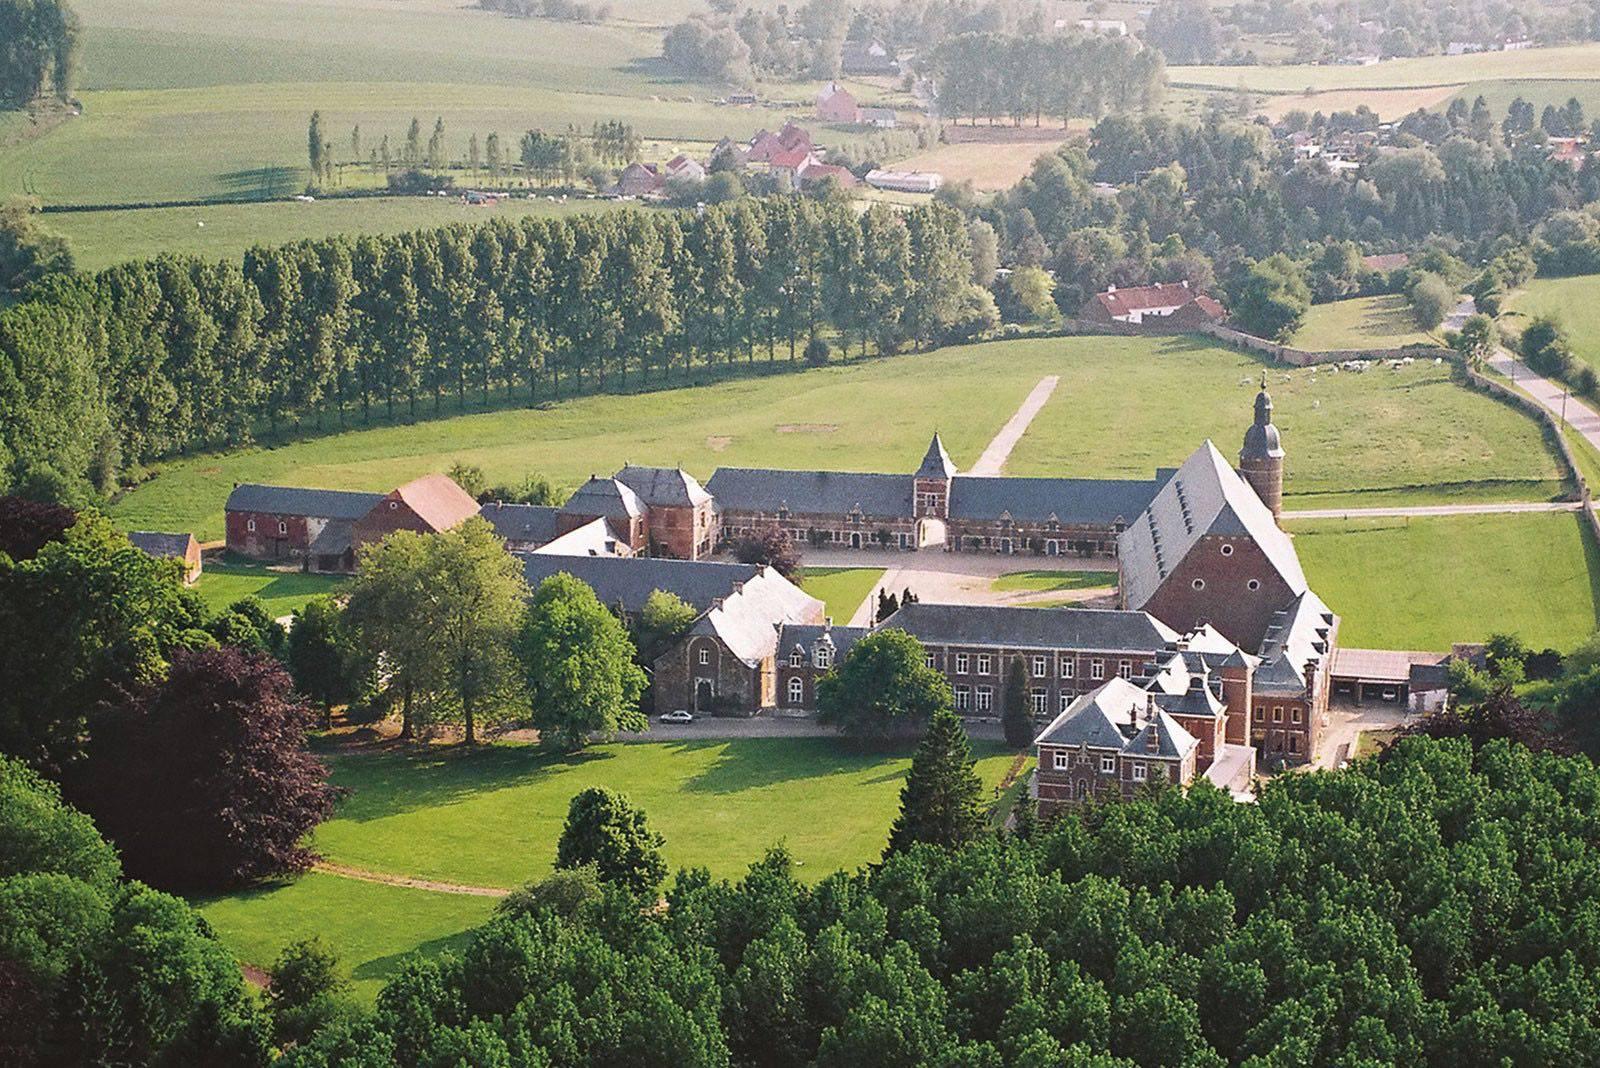 L'Abbaye de La Ramée - Feestzaal - House of Weddings - 1 (1)